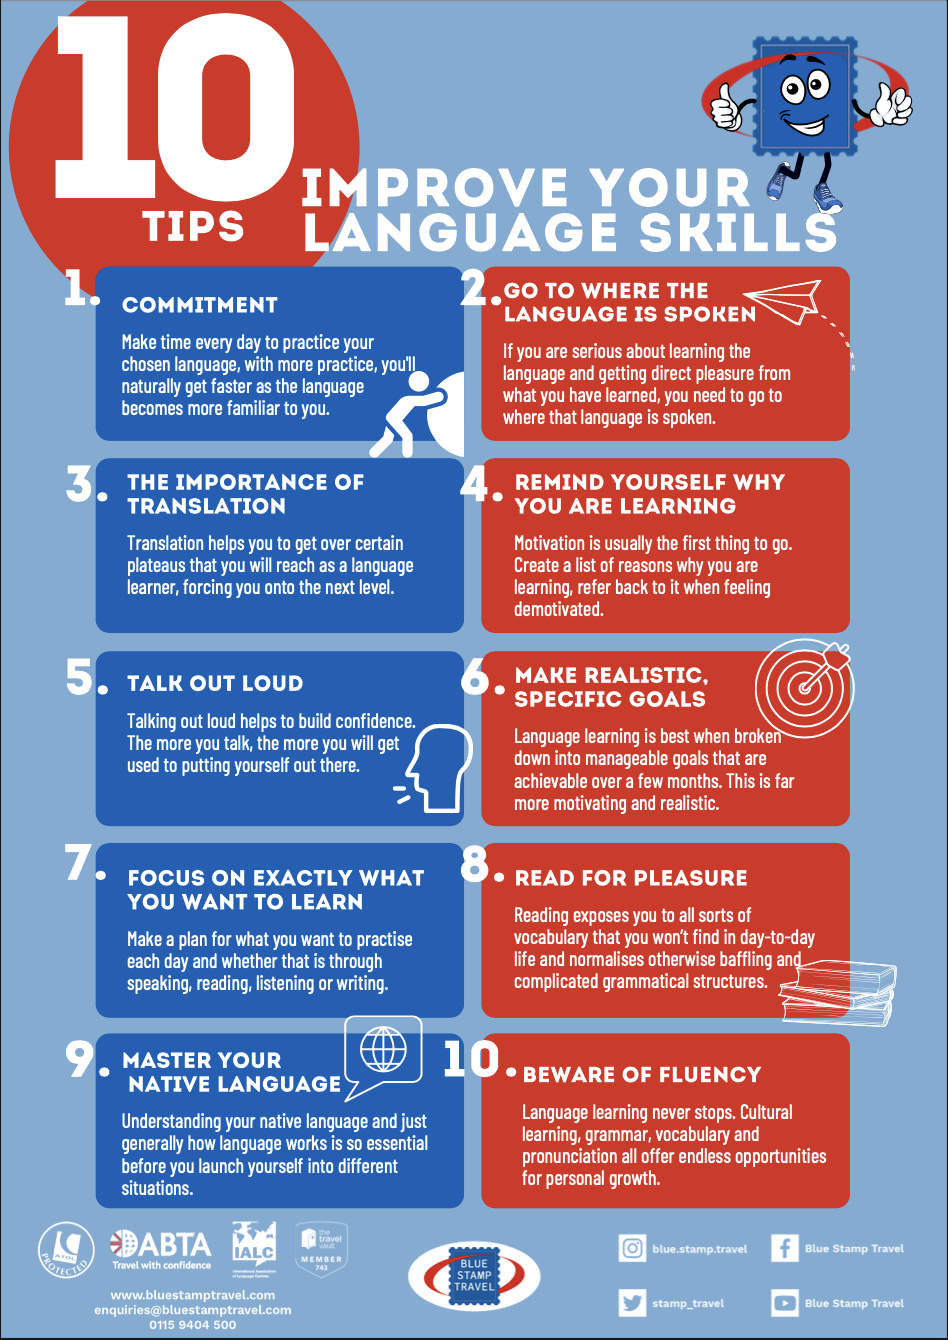 10 Tips to Improve Your Language Skills